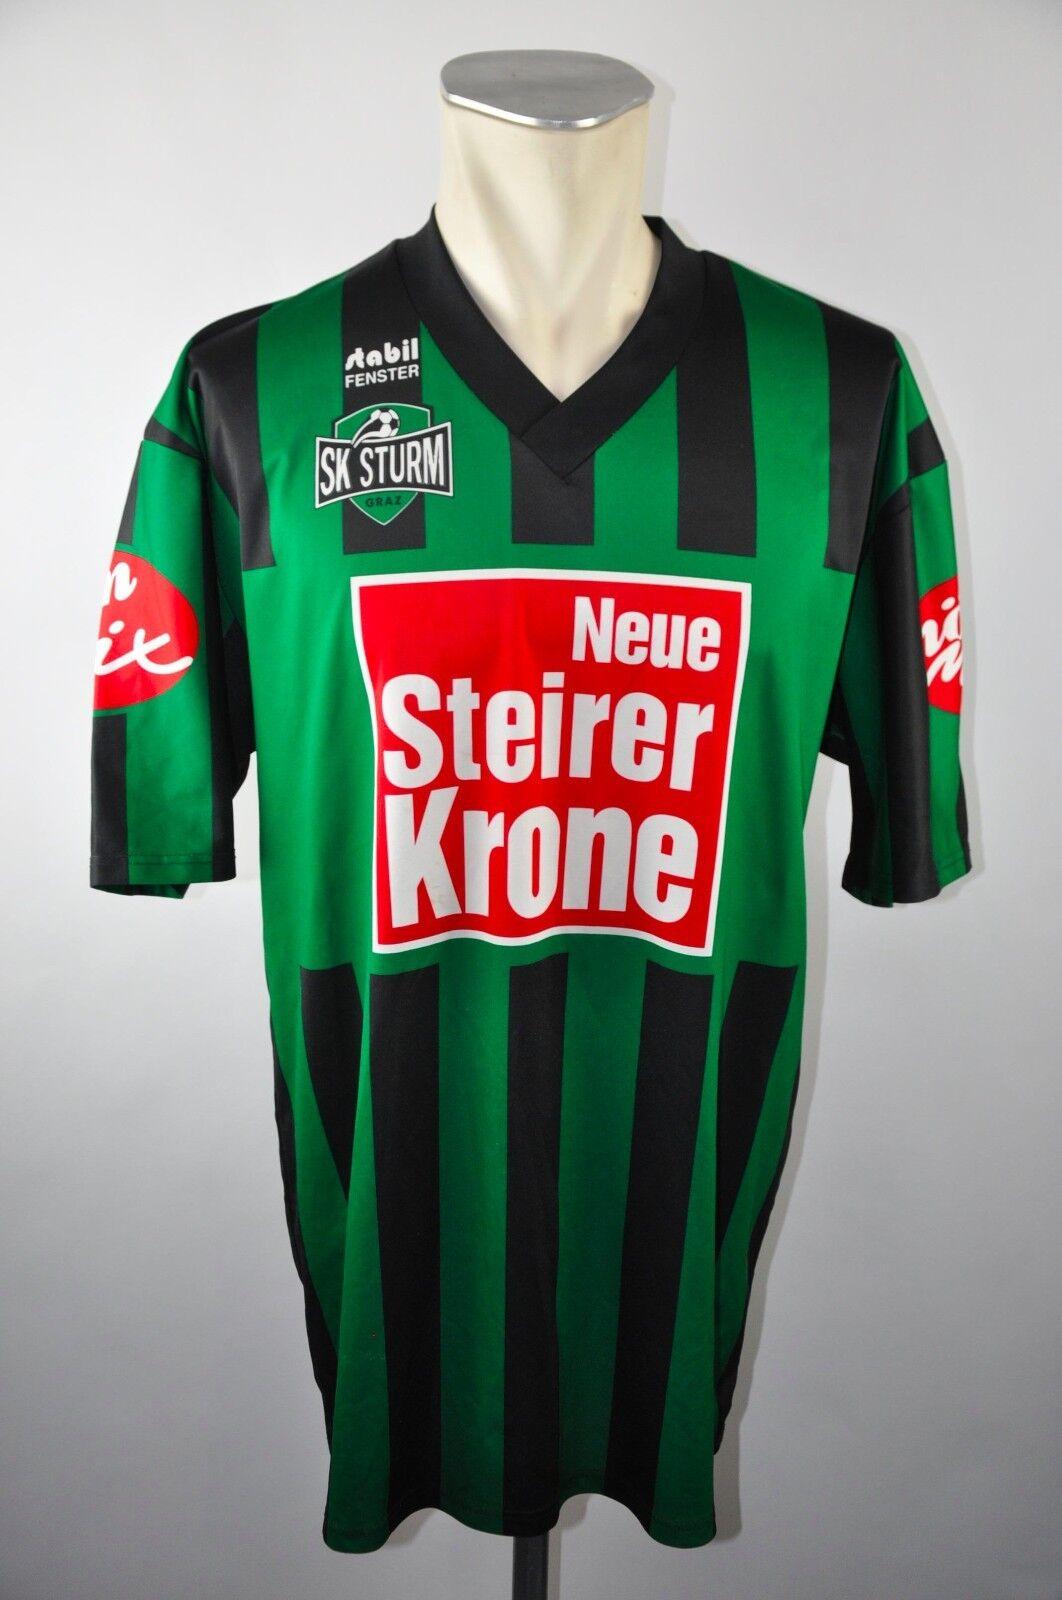 SK Sturm Graz Trikot 90er Gr. XL Neue Steirer Krone green Masita Stabil